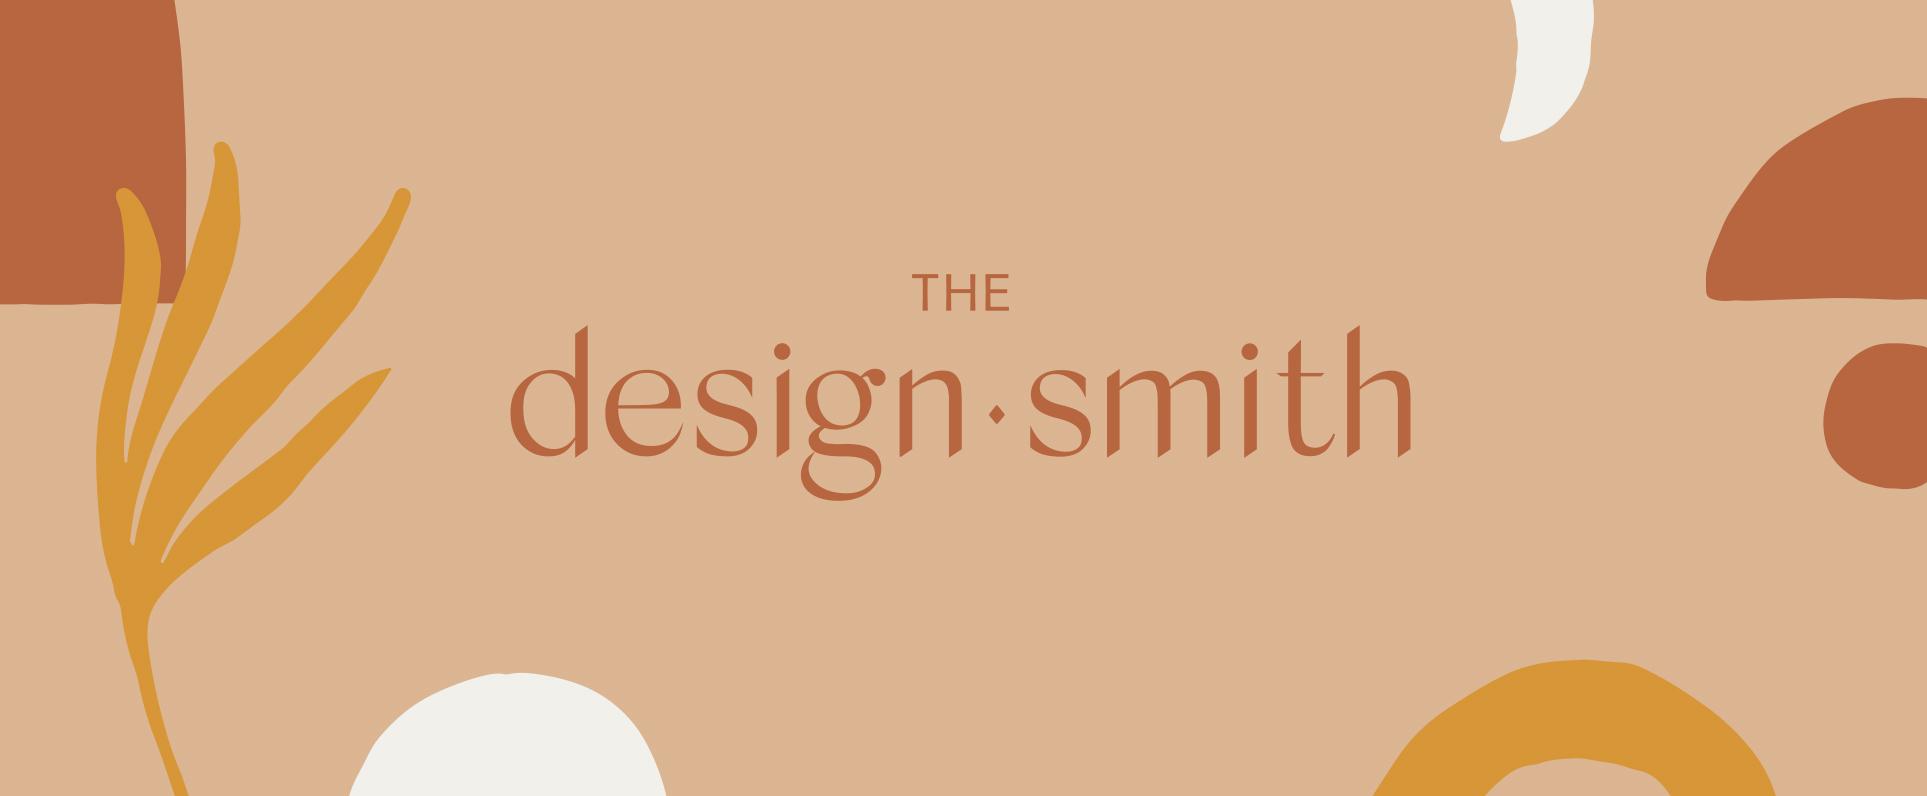 the-design-smith-banner.jpg